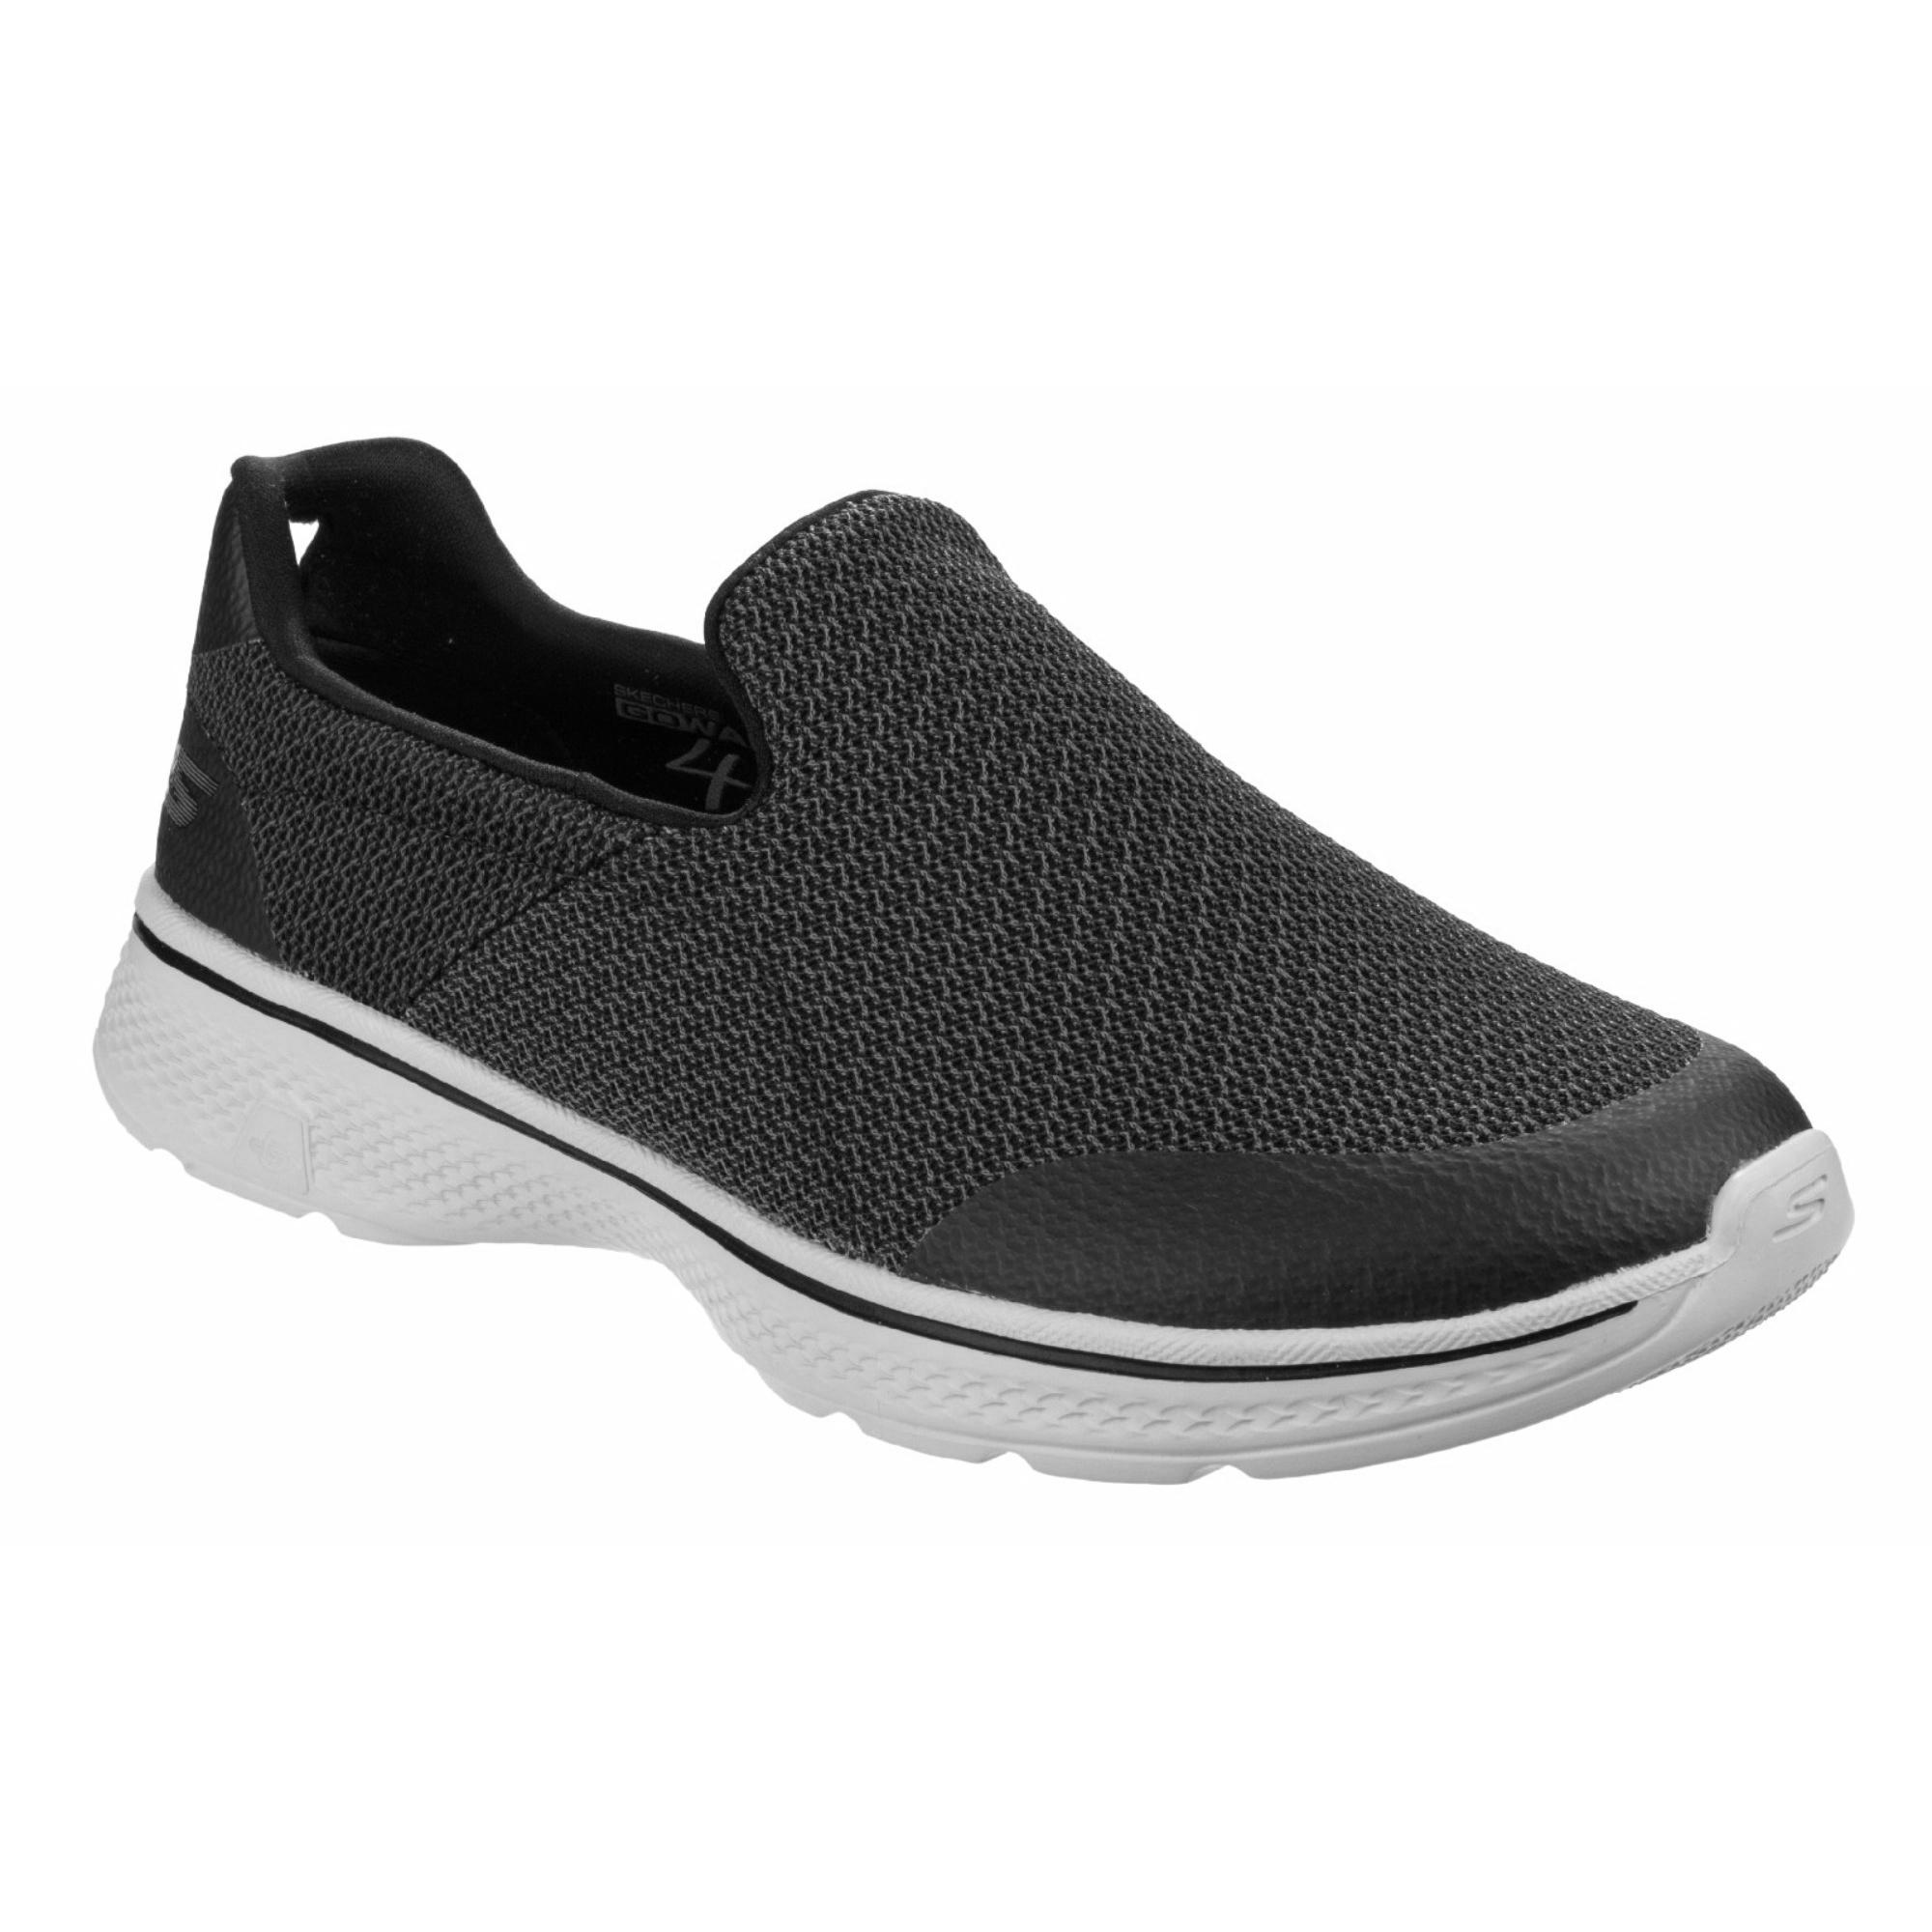 Skechers-Zapatos-sin-cordones-modelo-Go-Walk-4-Expert-para-hombre-FS4250